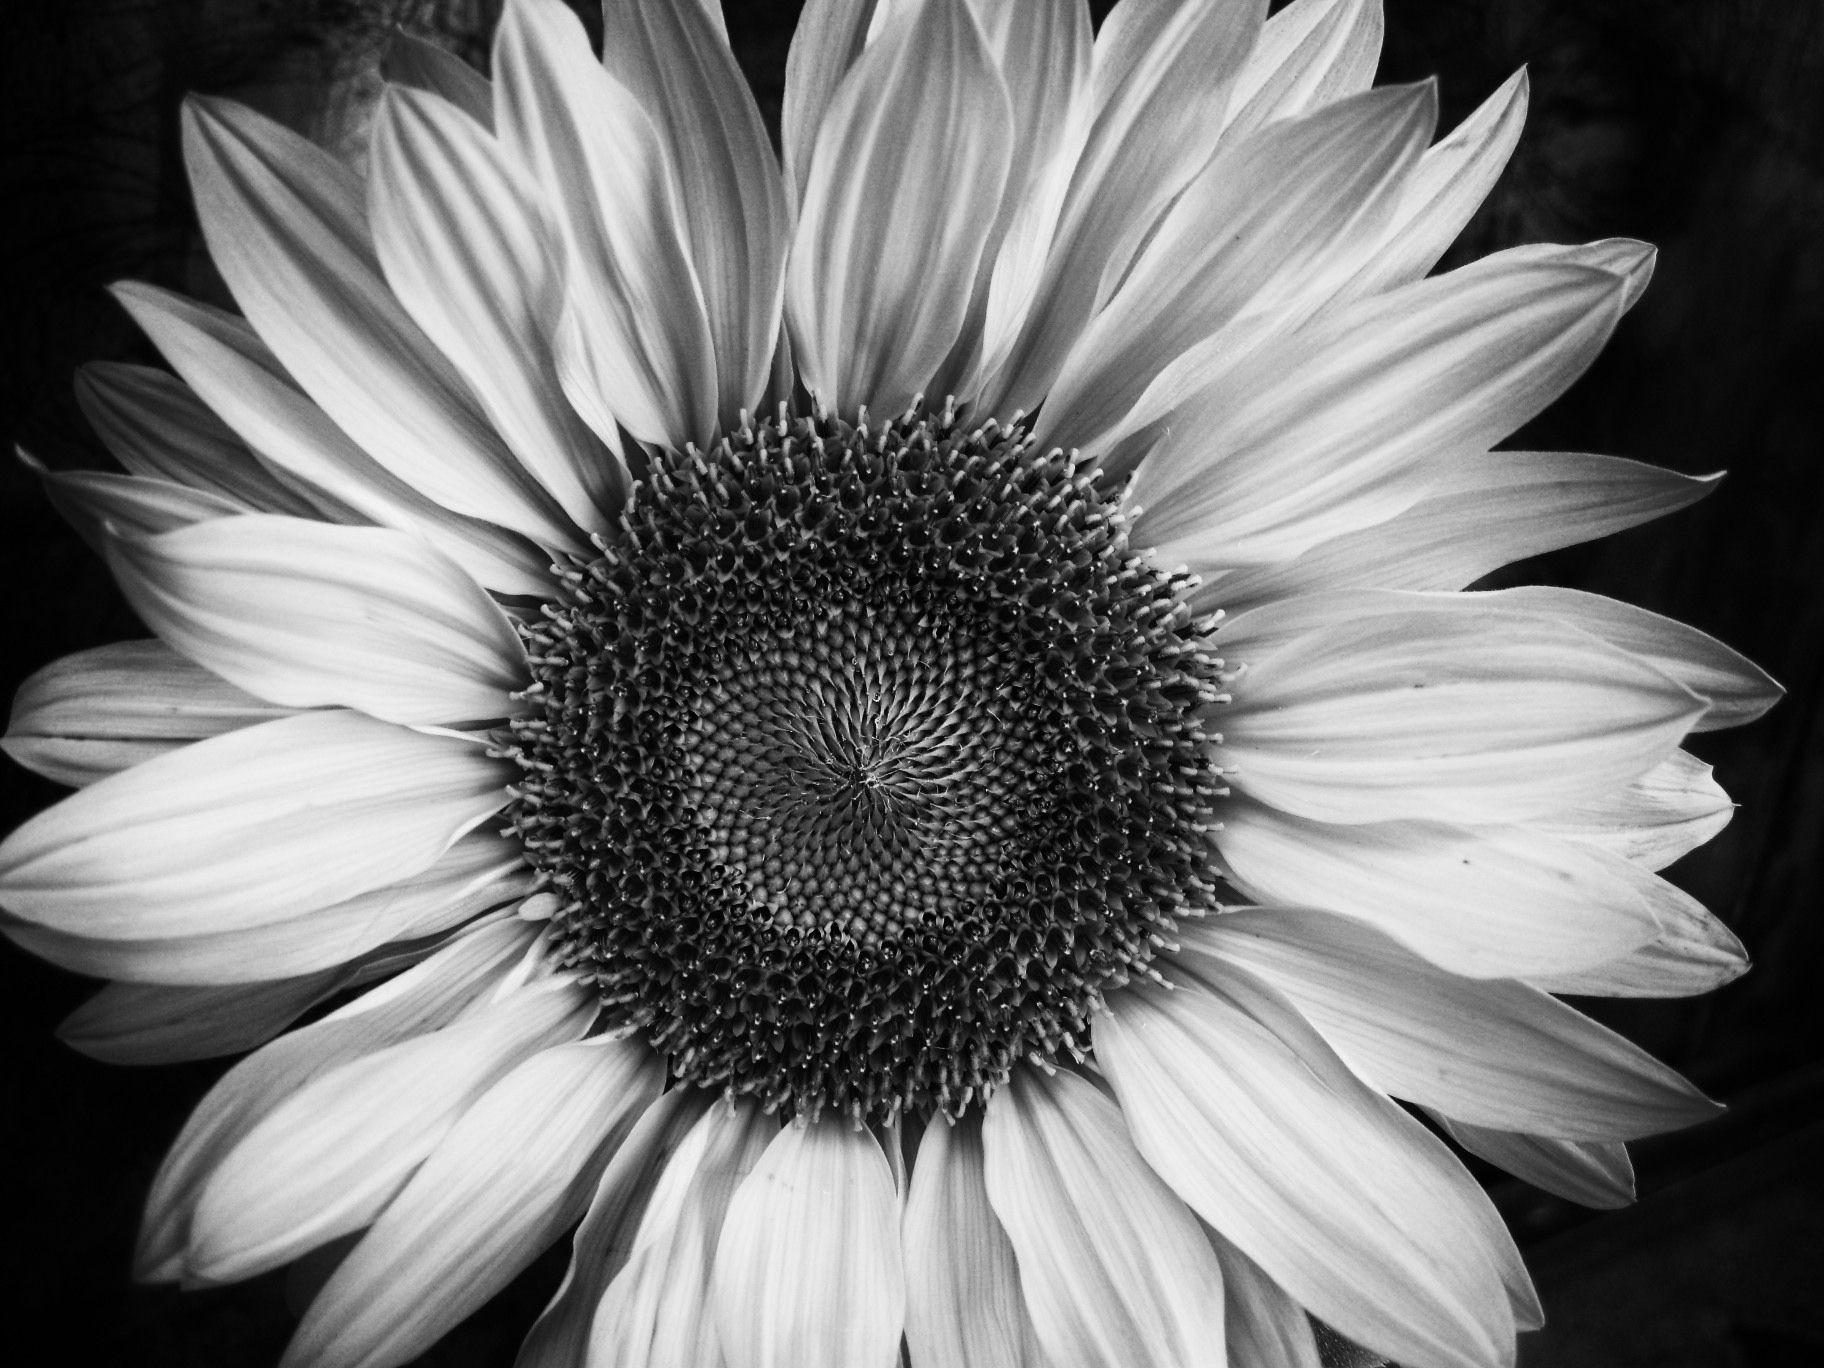 blackandwhiteflowerpictures.jpg White flower photos